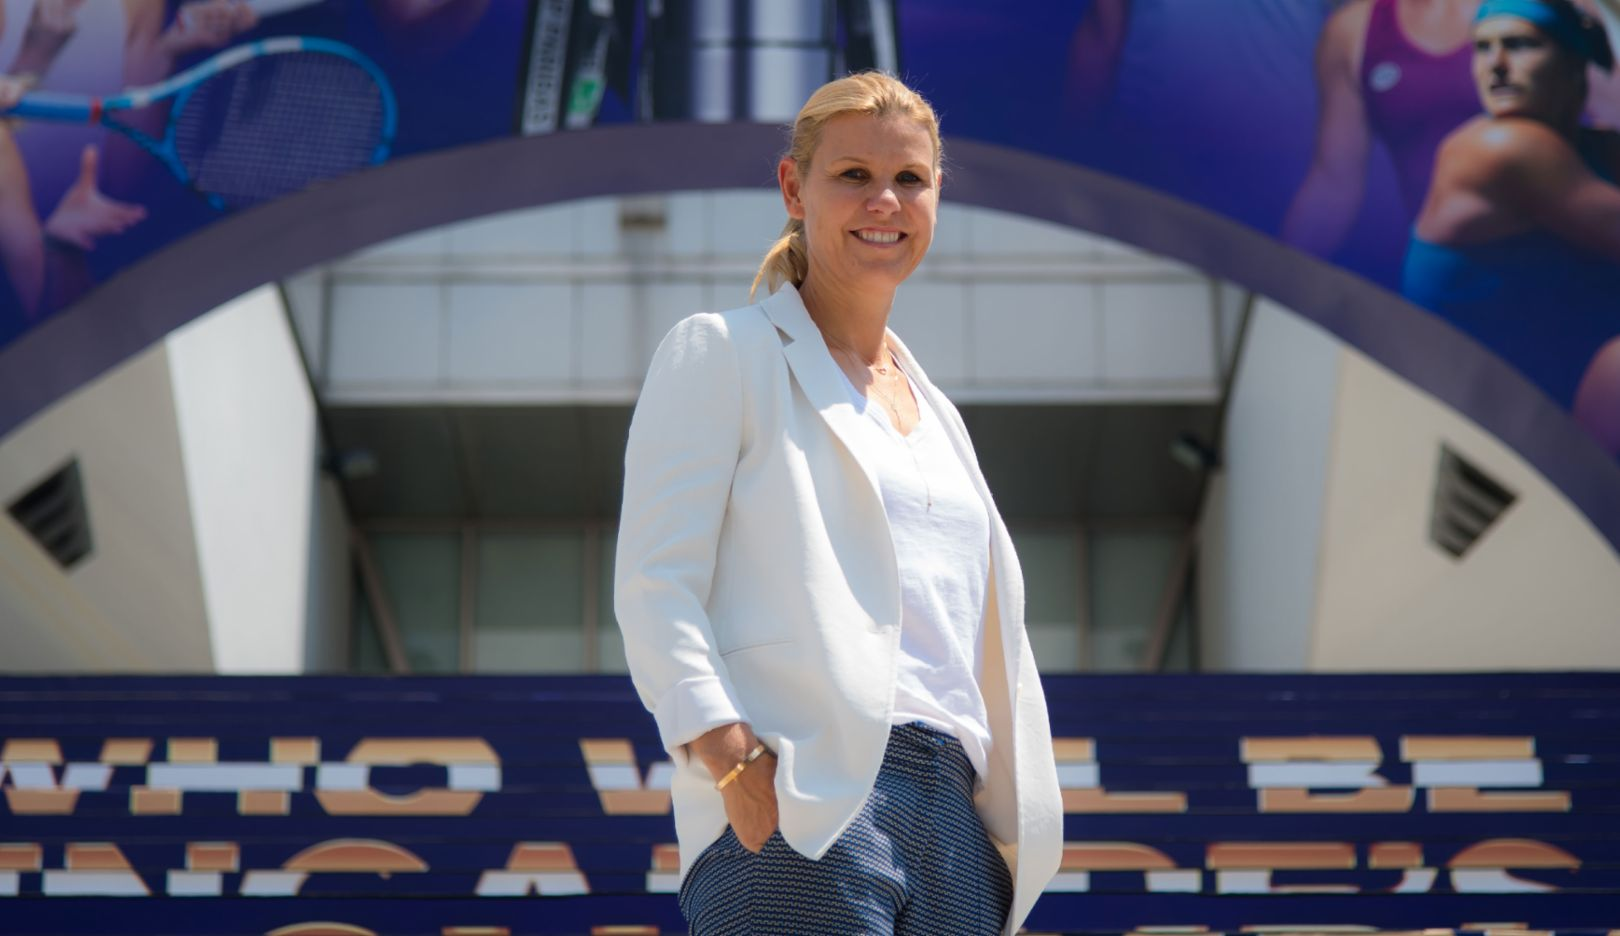 Anke Huber, Singapur, 2018, Porsche AG